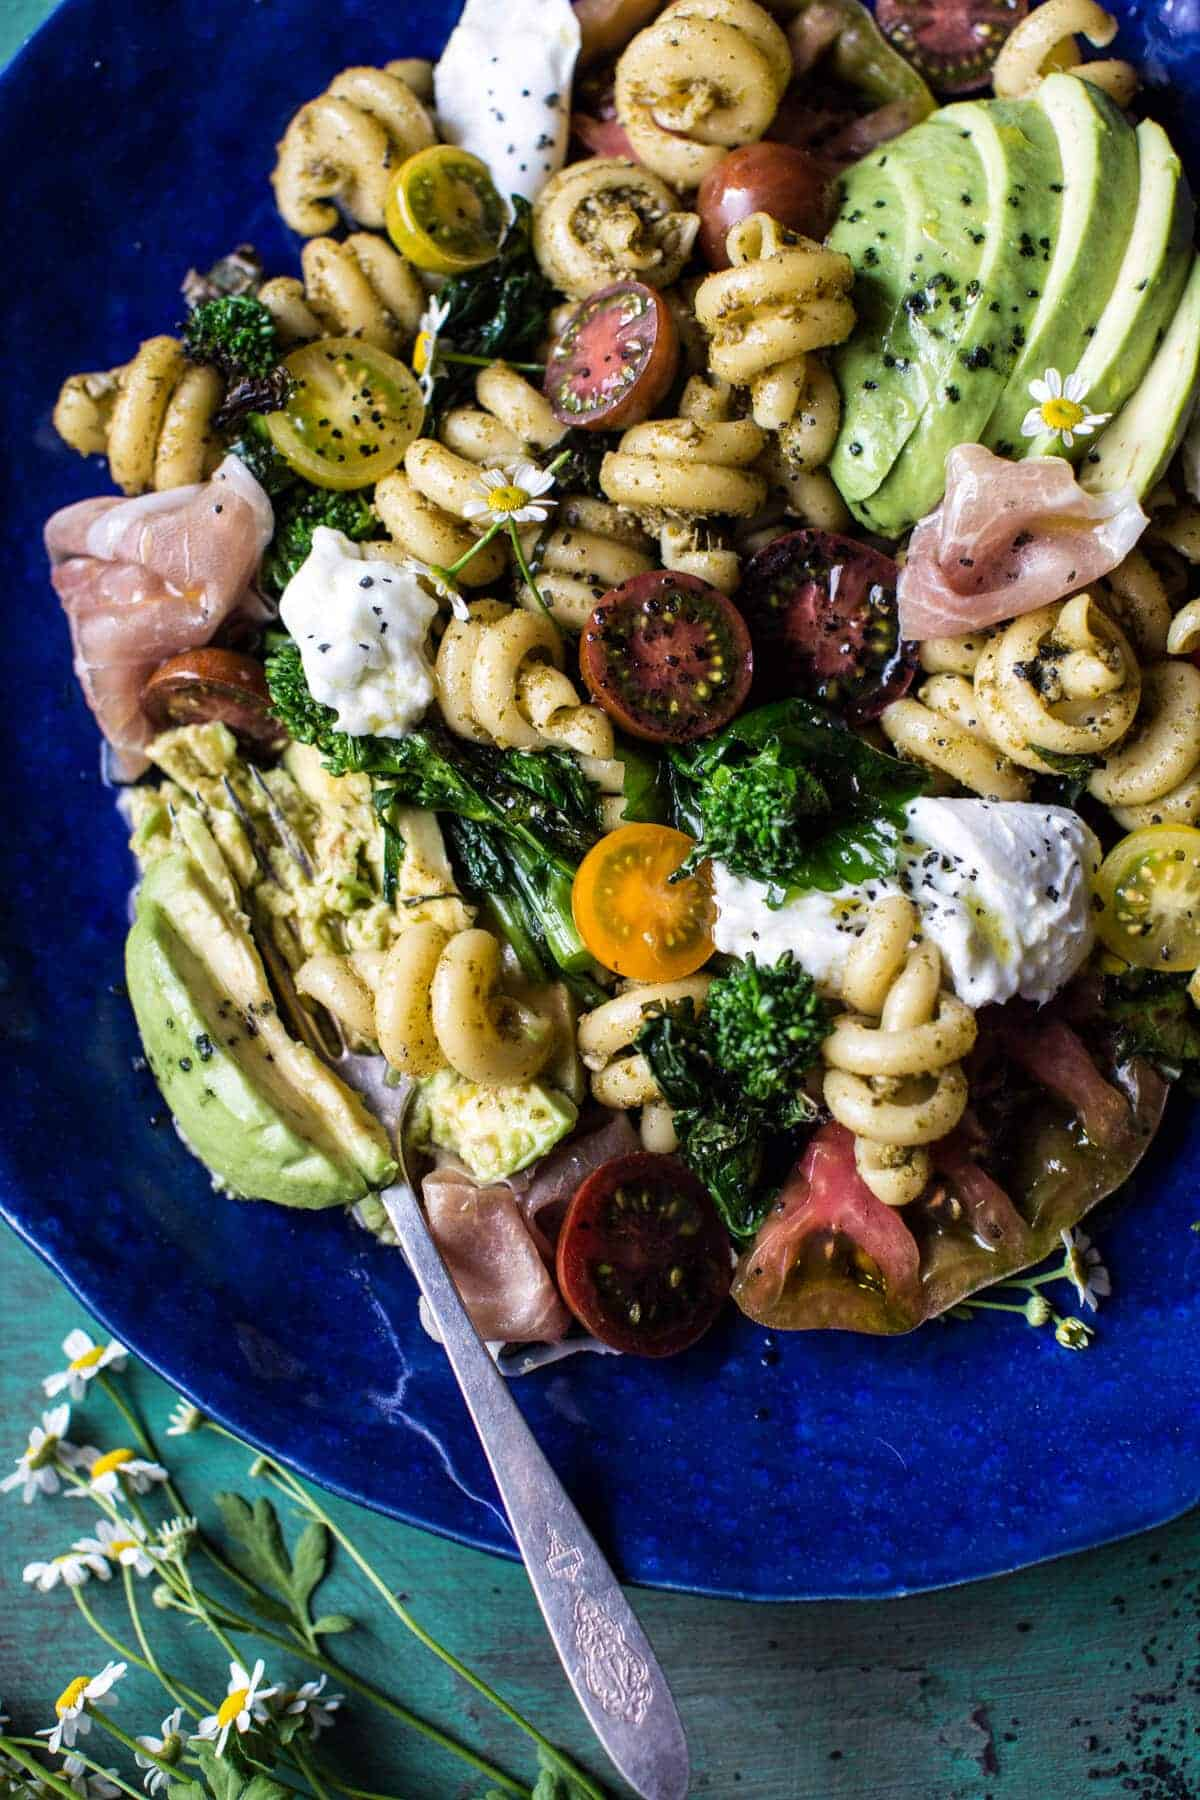 Avocado Caprese Pasta with Grilled Broccoli Rabe | halfbakedharvest.com @hbharvest